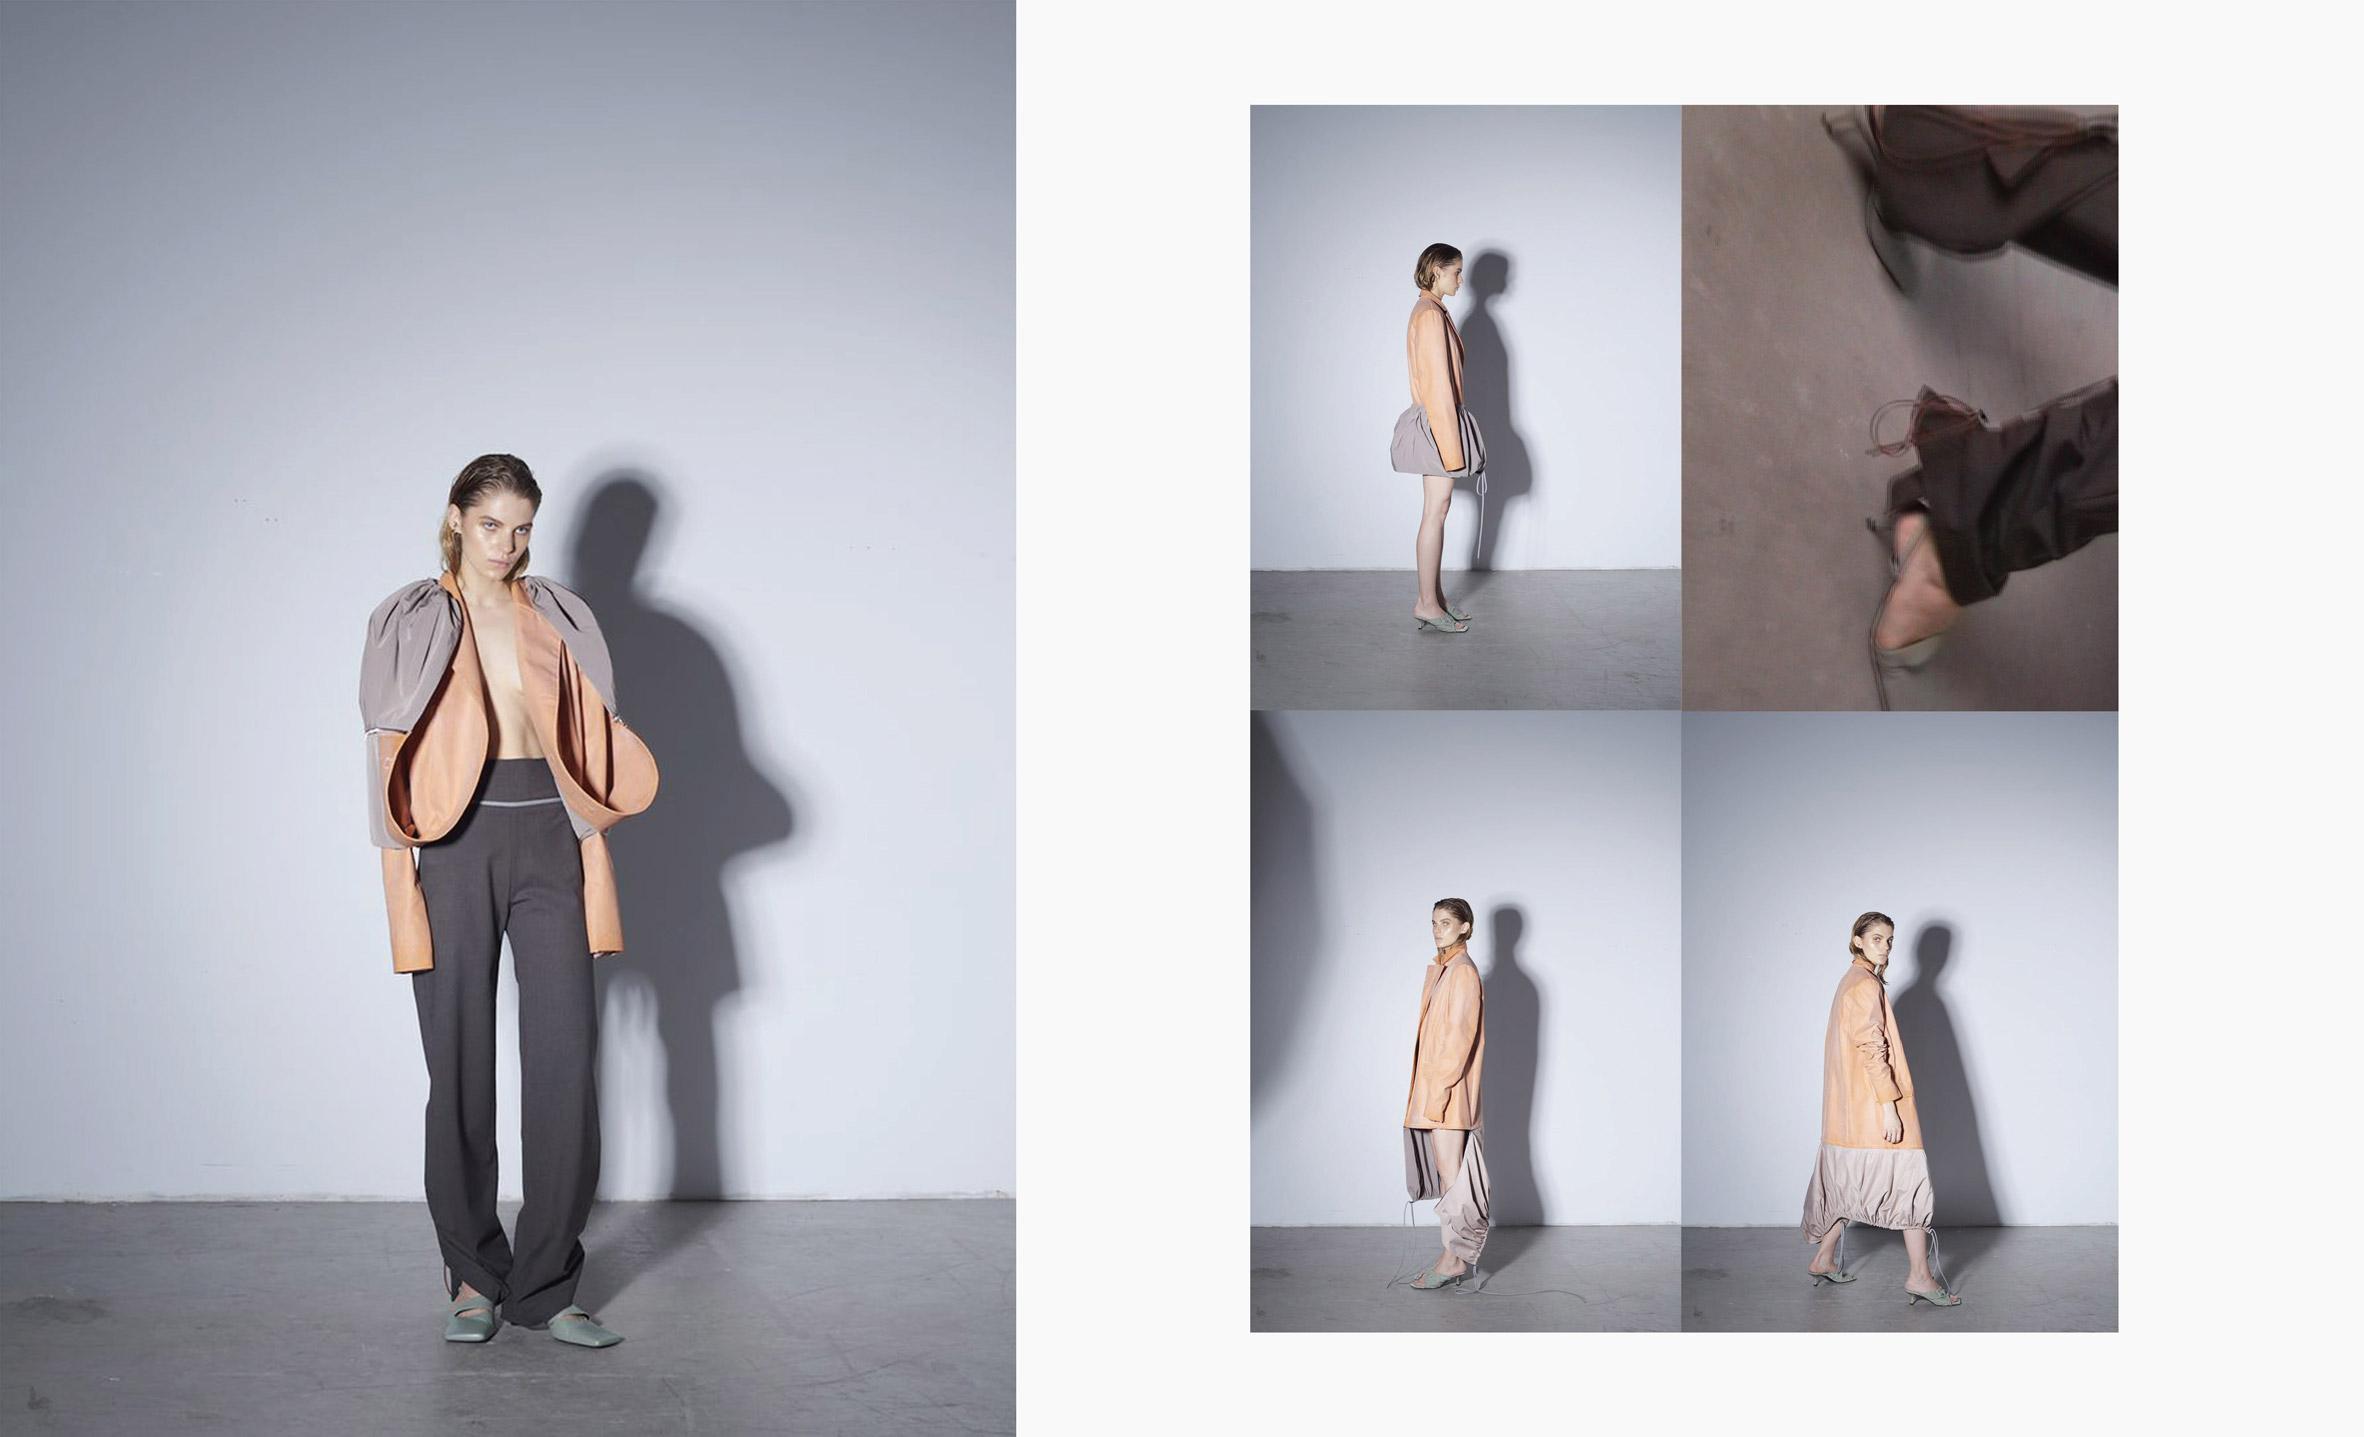 Memory of items fashion collection by Urtė Vosyliūtė